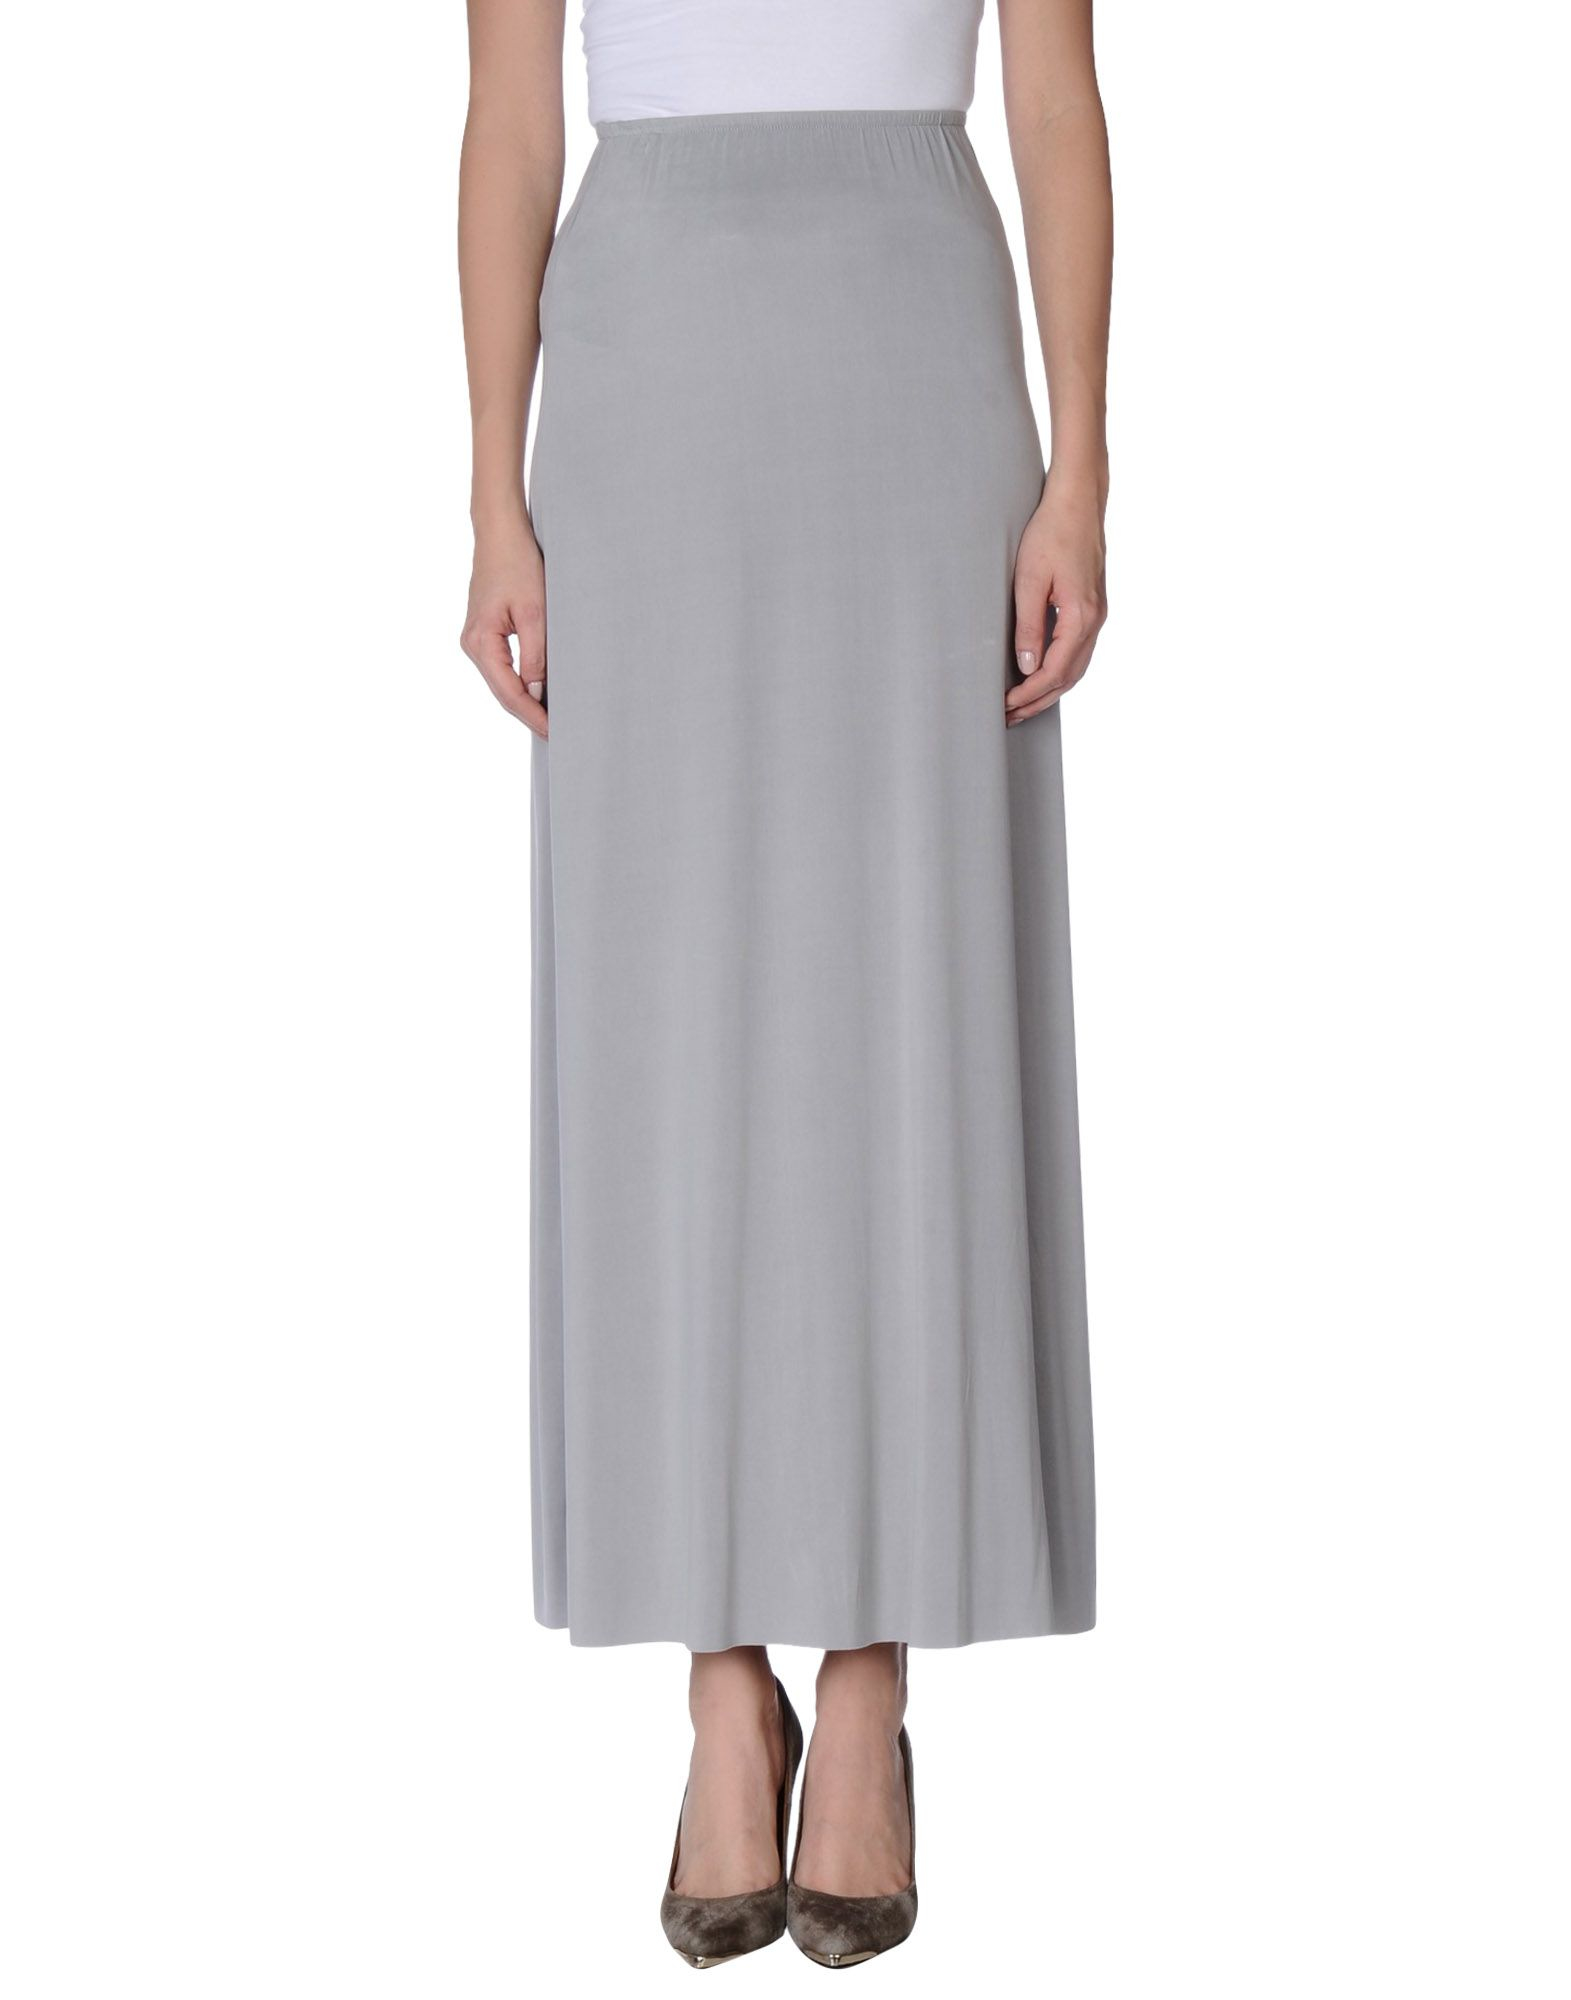 American vintage Long Skirt in Gray (Light grey)